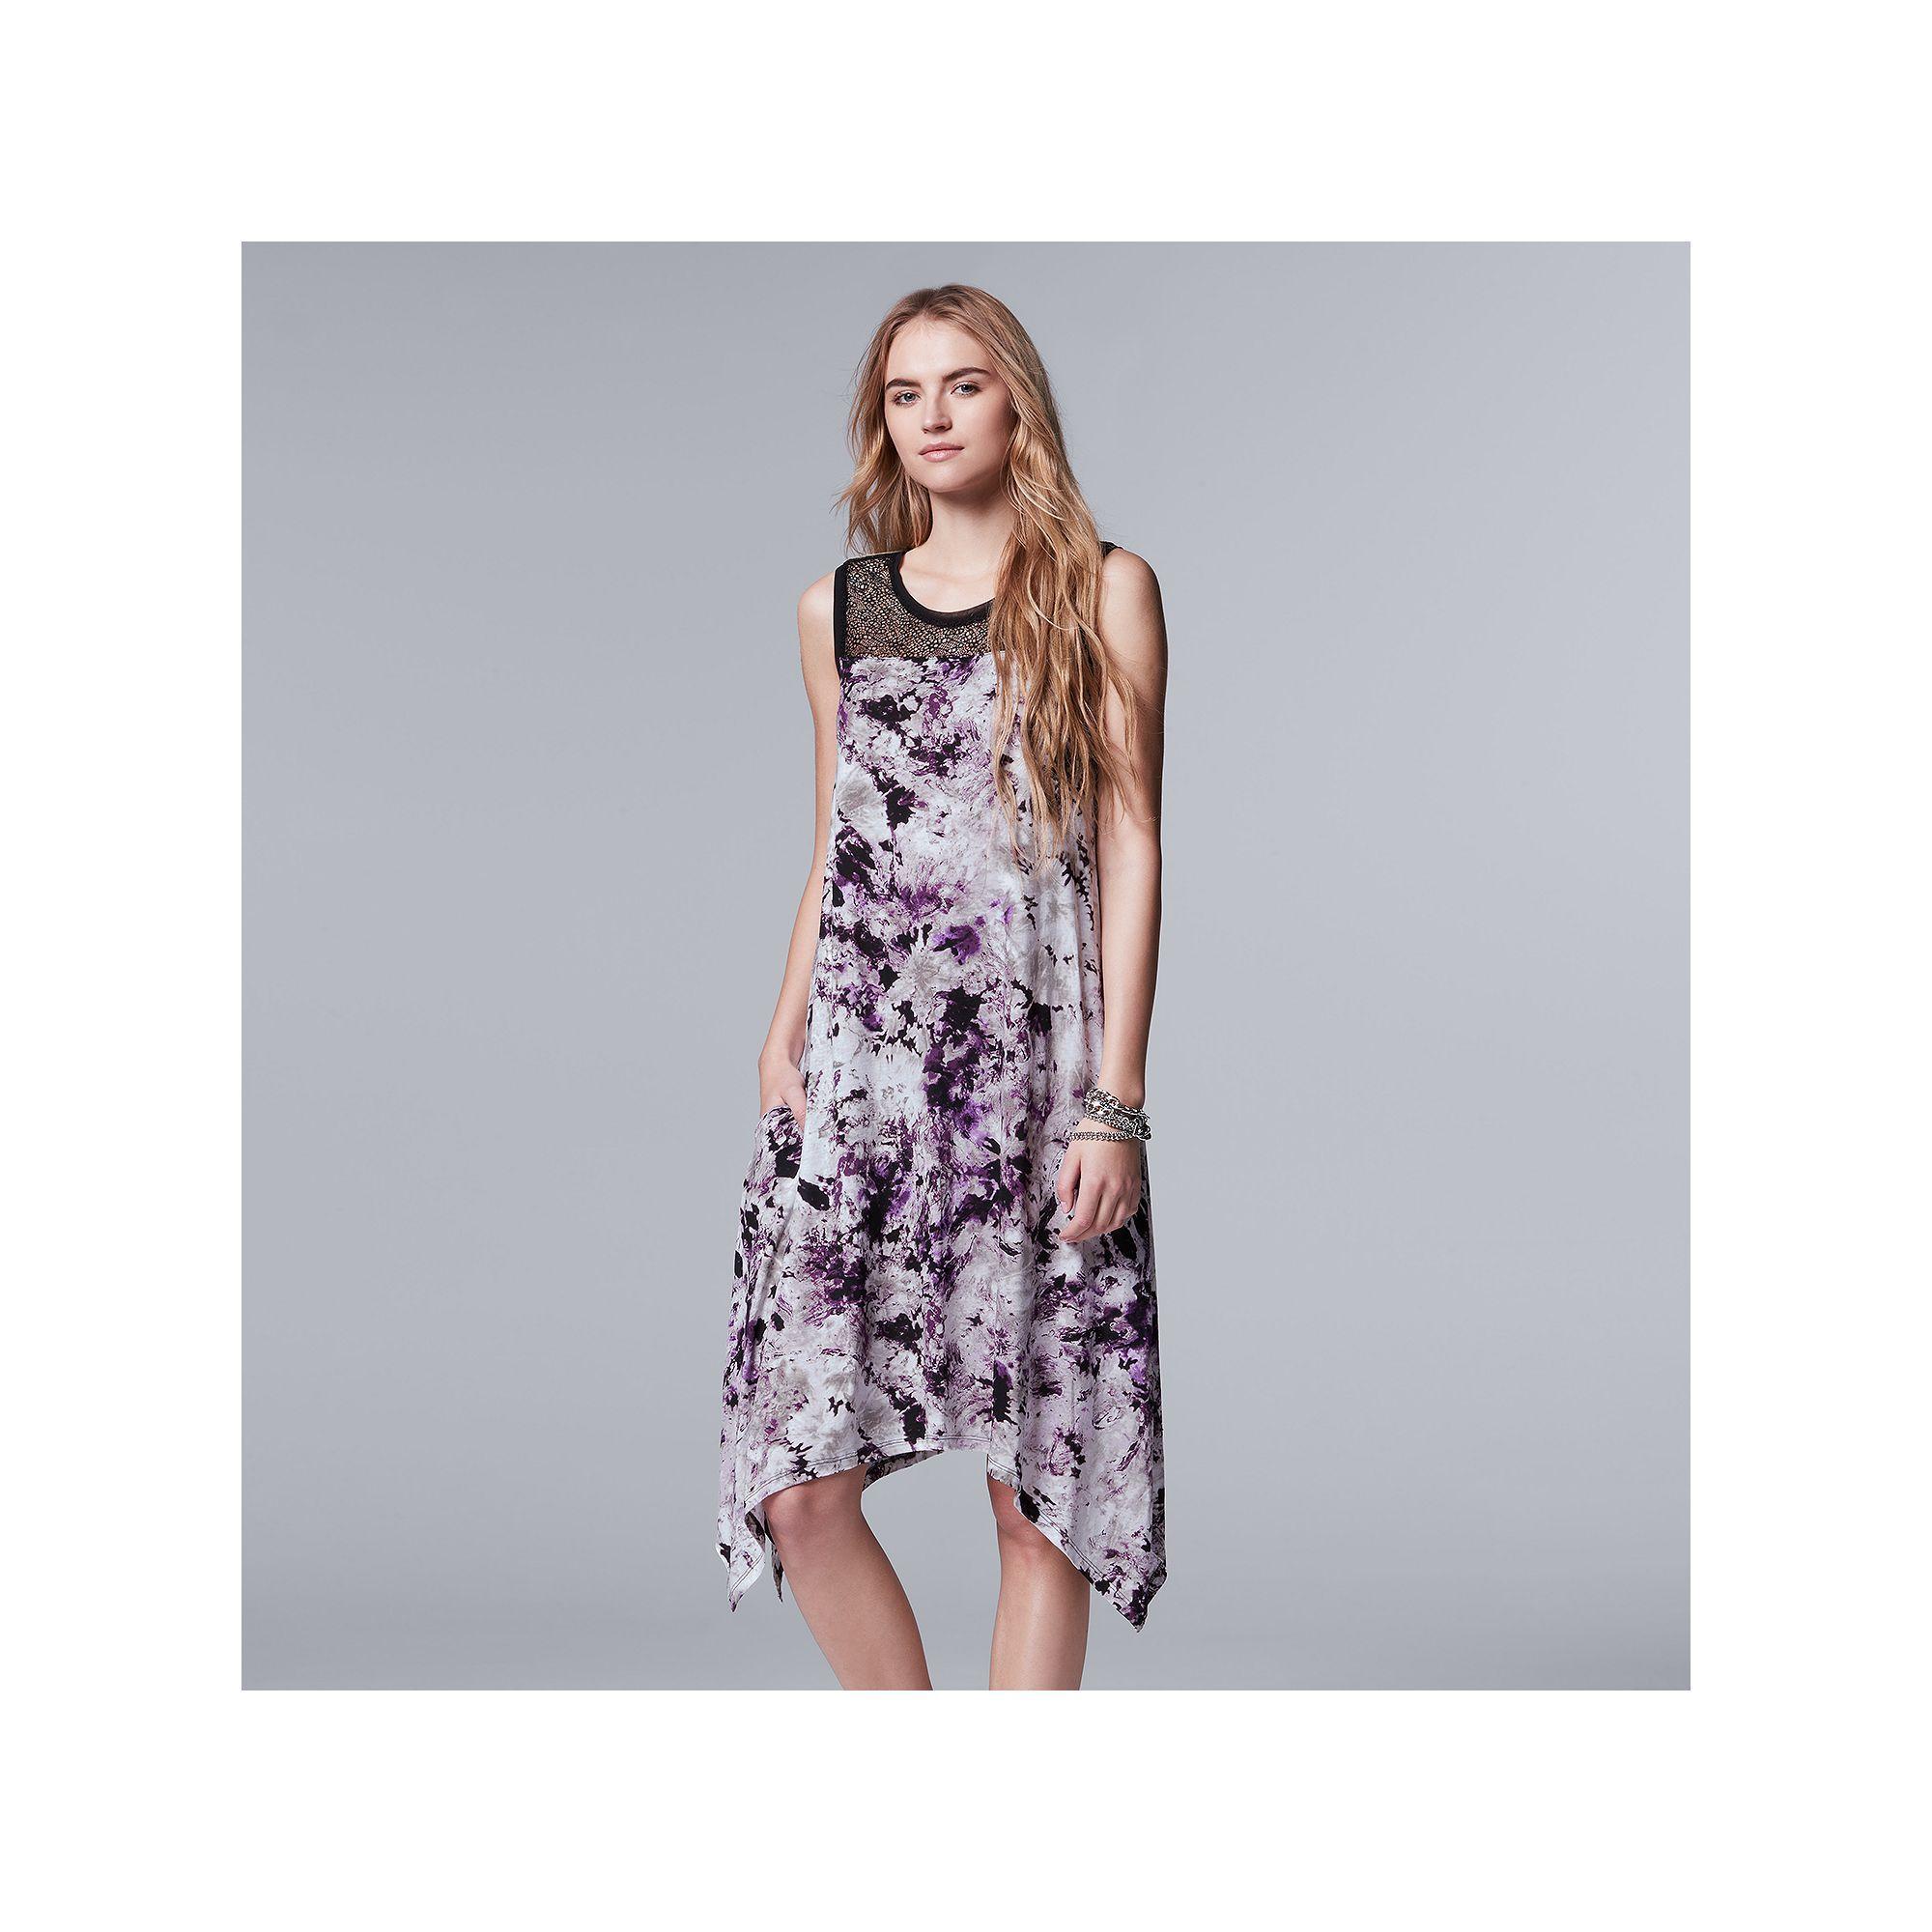 10ba0aff859 Women s Simply Vera Vera Wang Floral Lace Handkerchief Dress ...